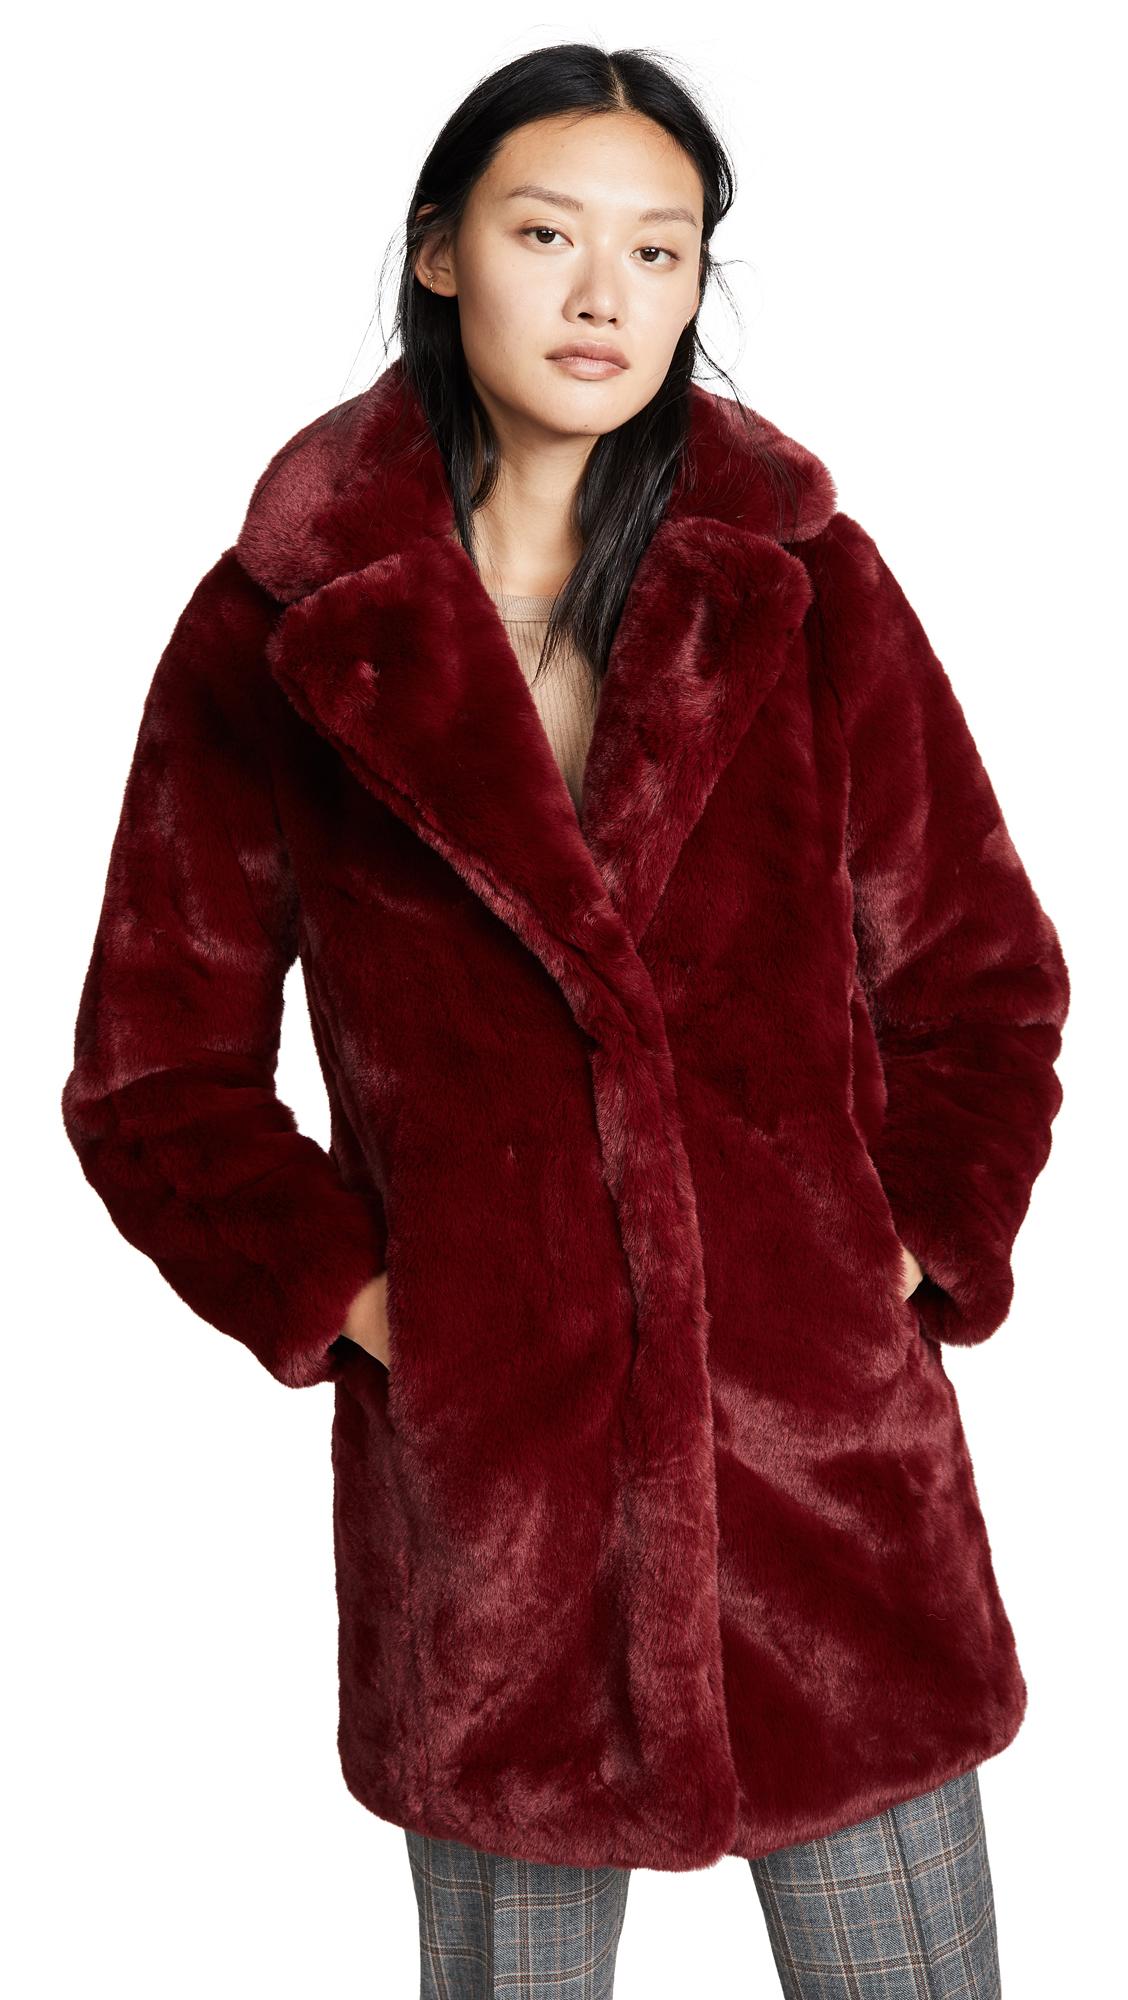 MKT STUDIO Marili Faux Fur Coat in Cherry